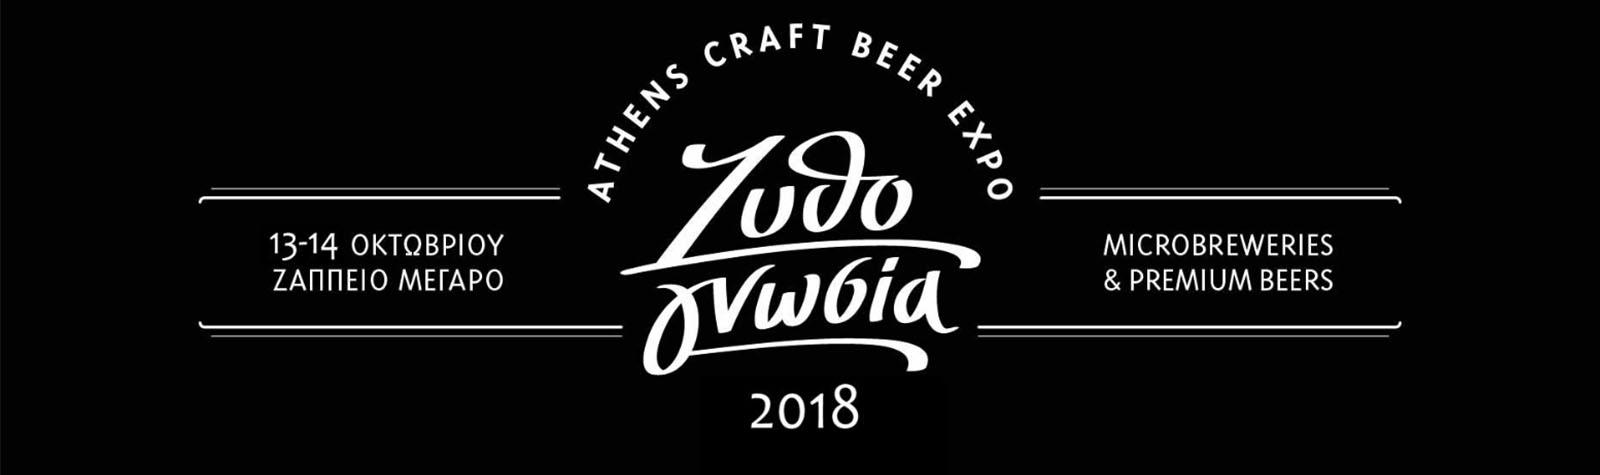 Athens Craft Beer Expo Ζάππειο - Ζυθογνωσία